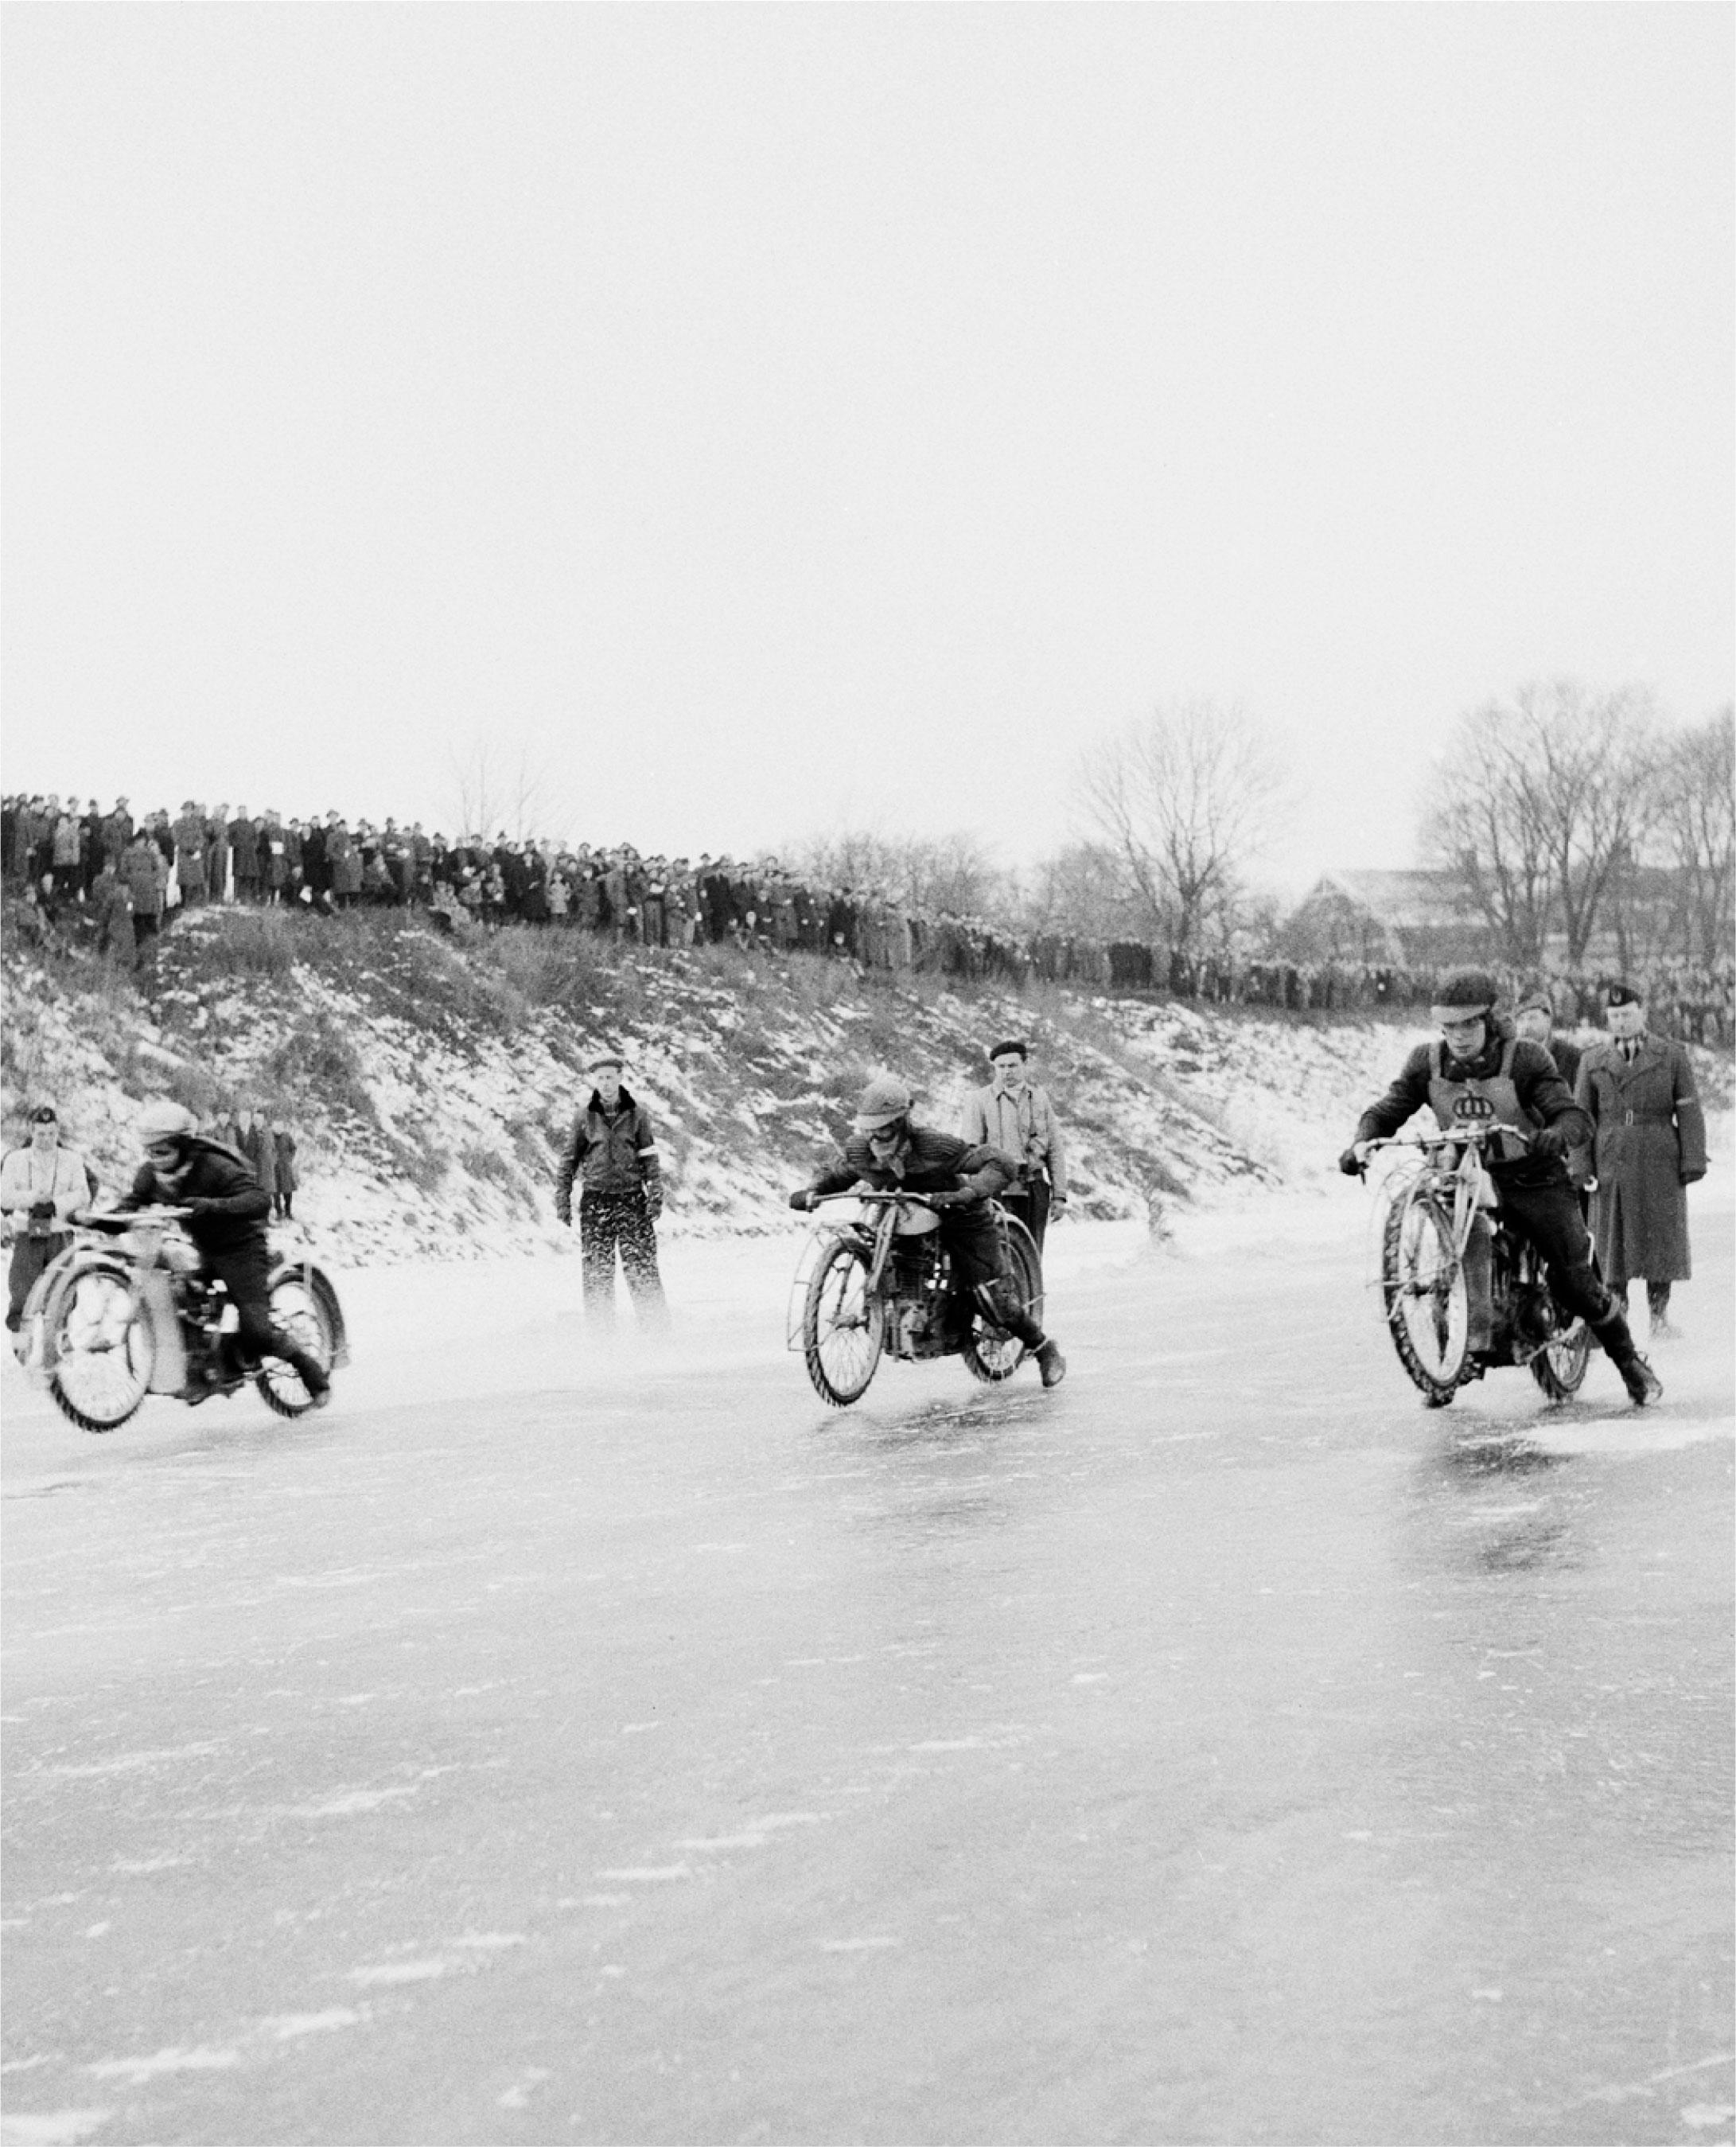 Isracing i Hålan, 1950-tal. Foto: ©Kulturmagasinet/Helsingborgs museer.